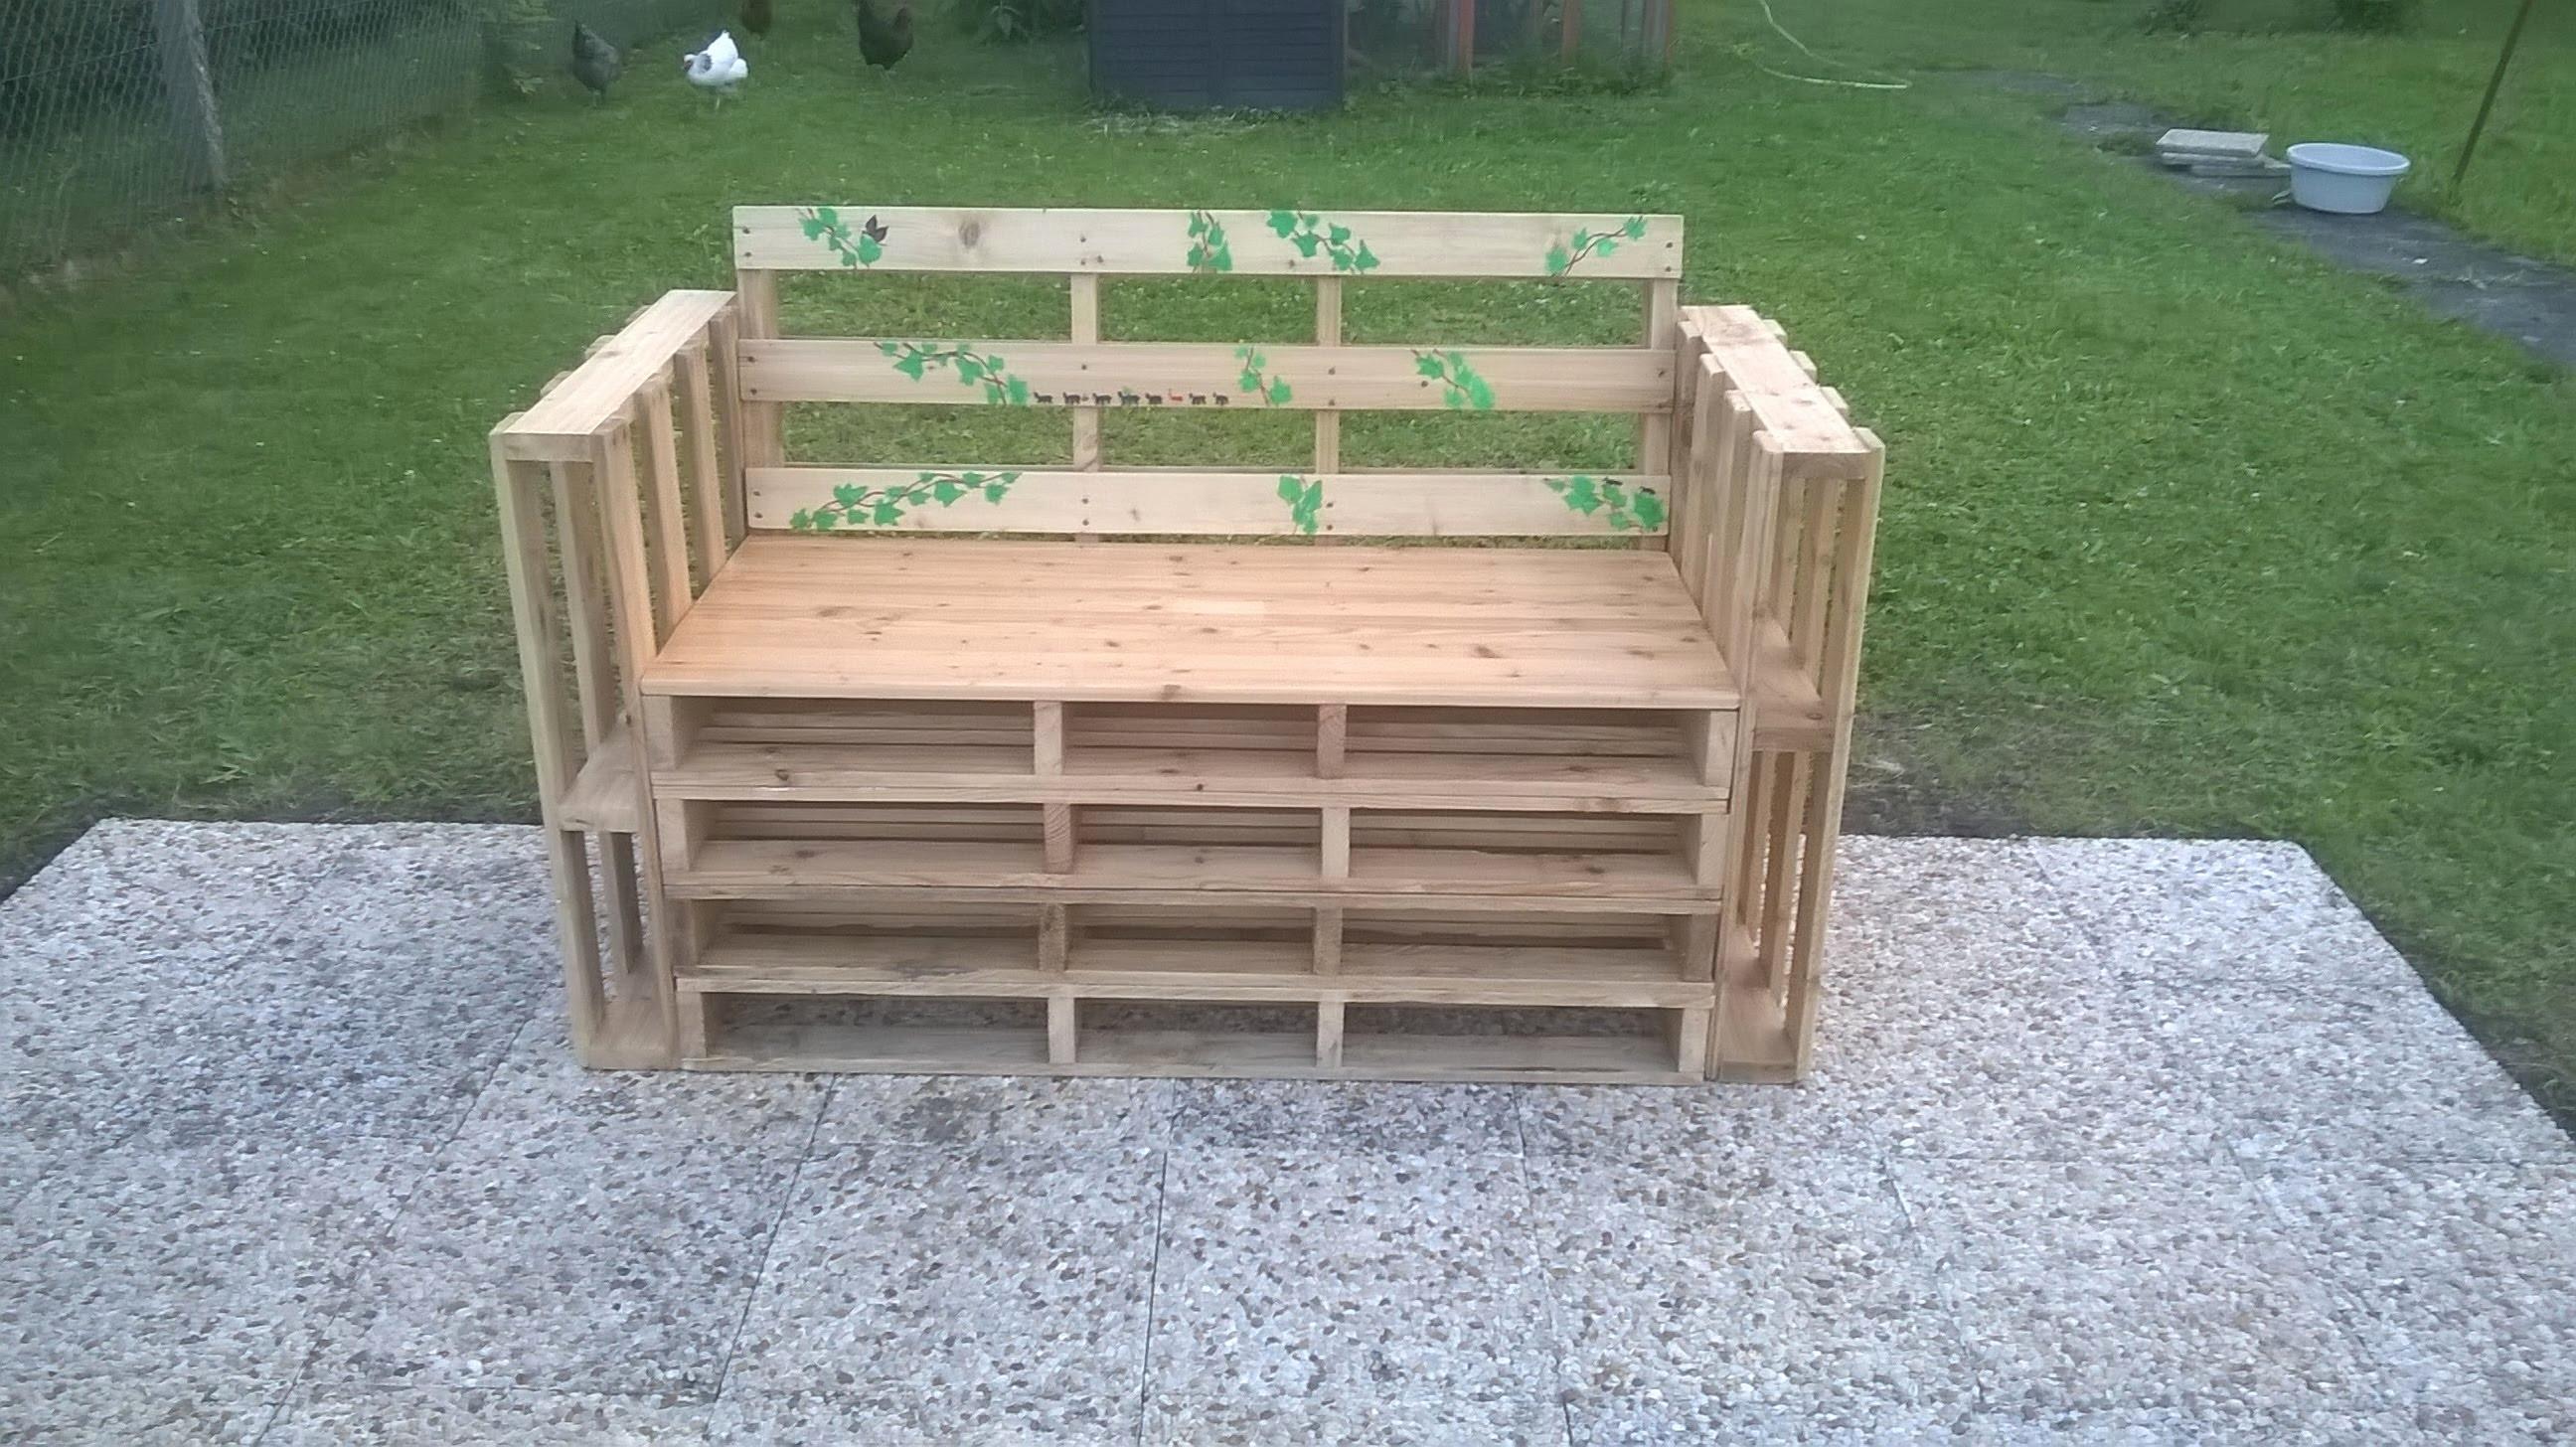 Table Basse Amazon Beau Photos Fabriquer Une Table De Jardin Ainsi Que Aimable Banco Jardin Nuevo